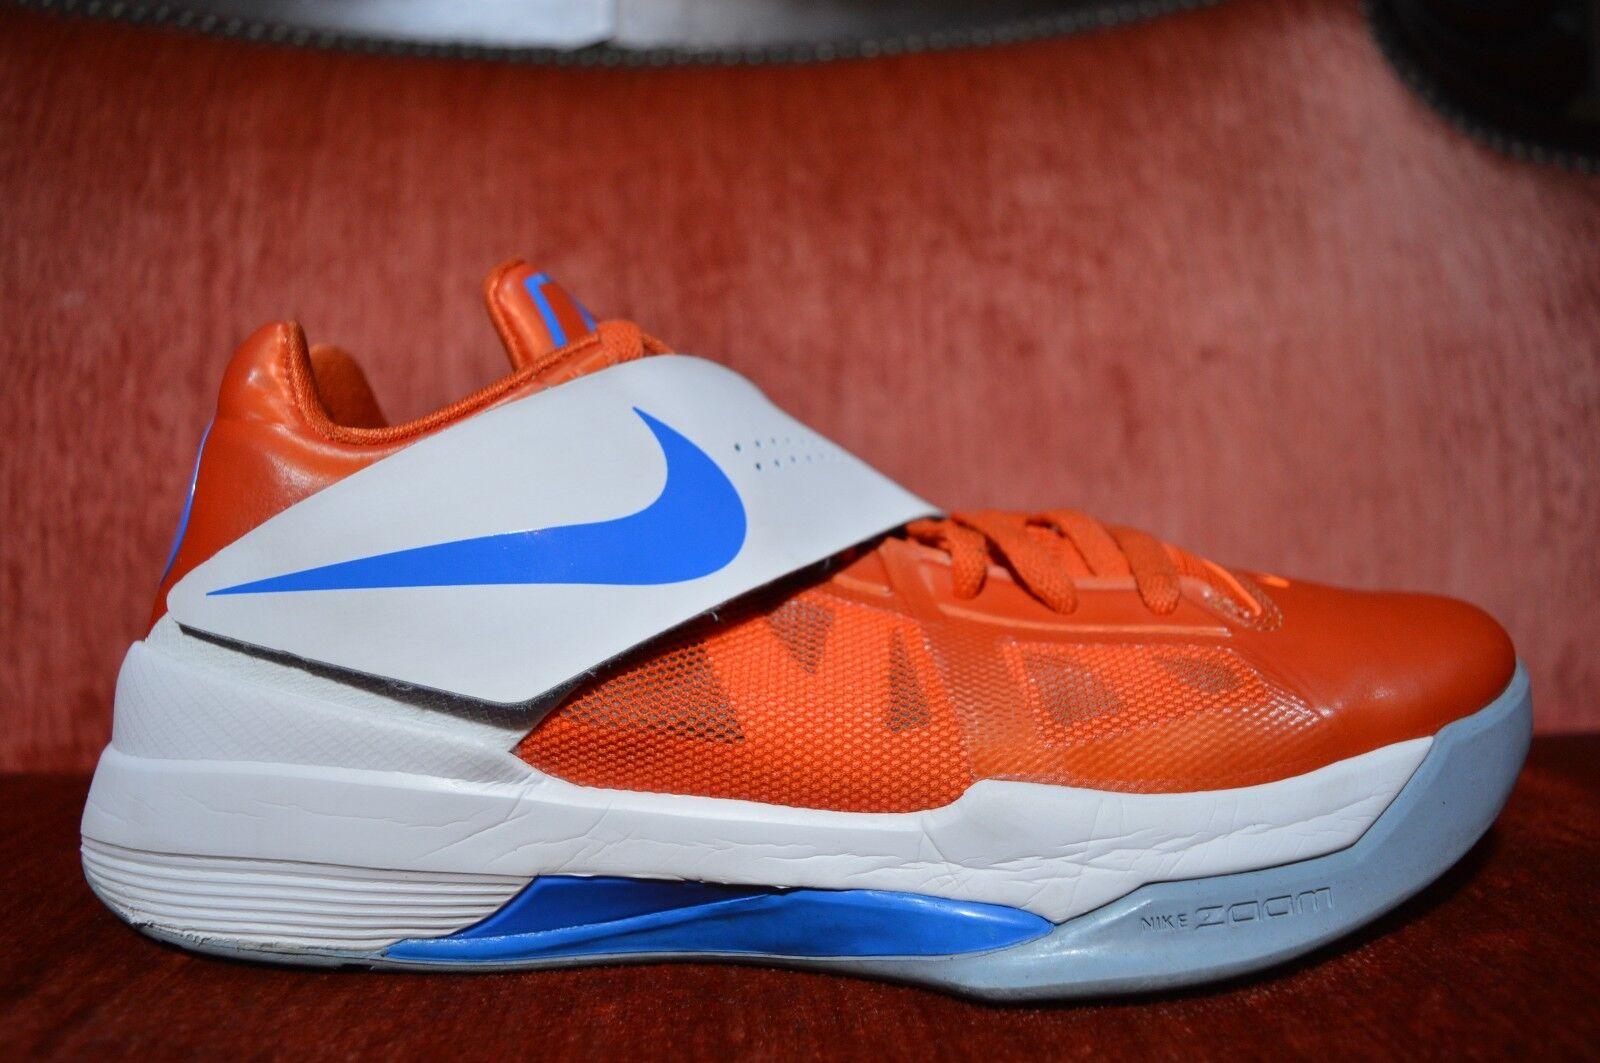 Nike zoom kevin durant kd iv 4 orange eis orange 4 - e 473679 800  10 eybl 3adb16